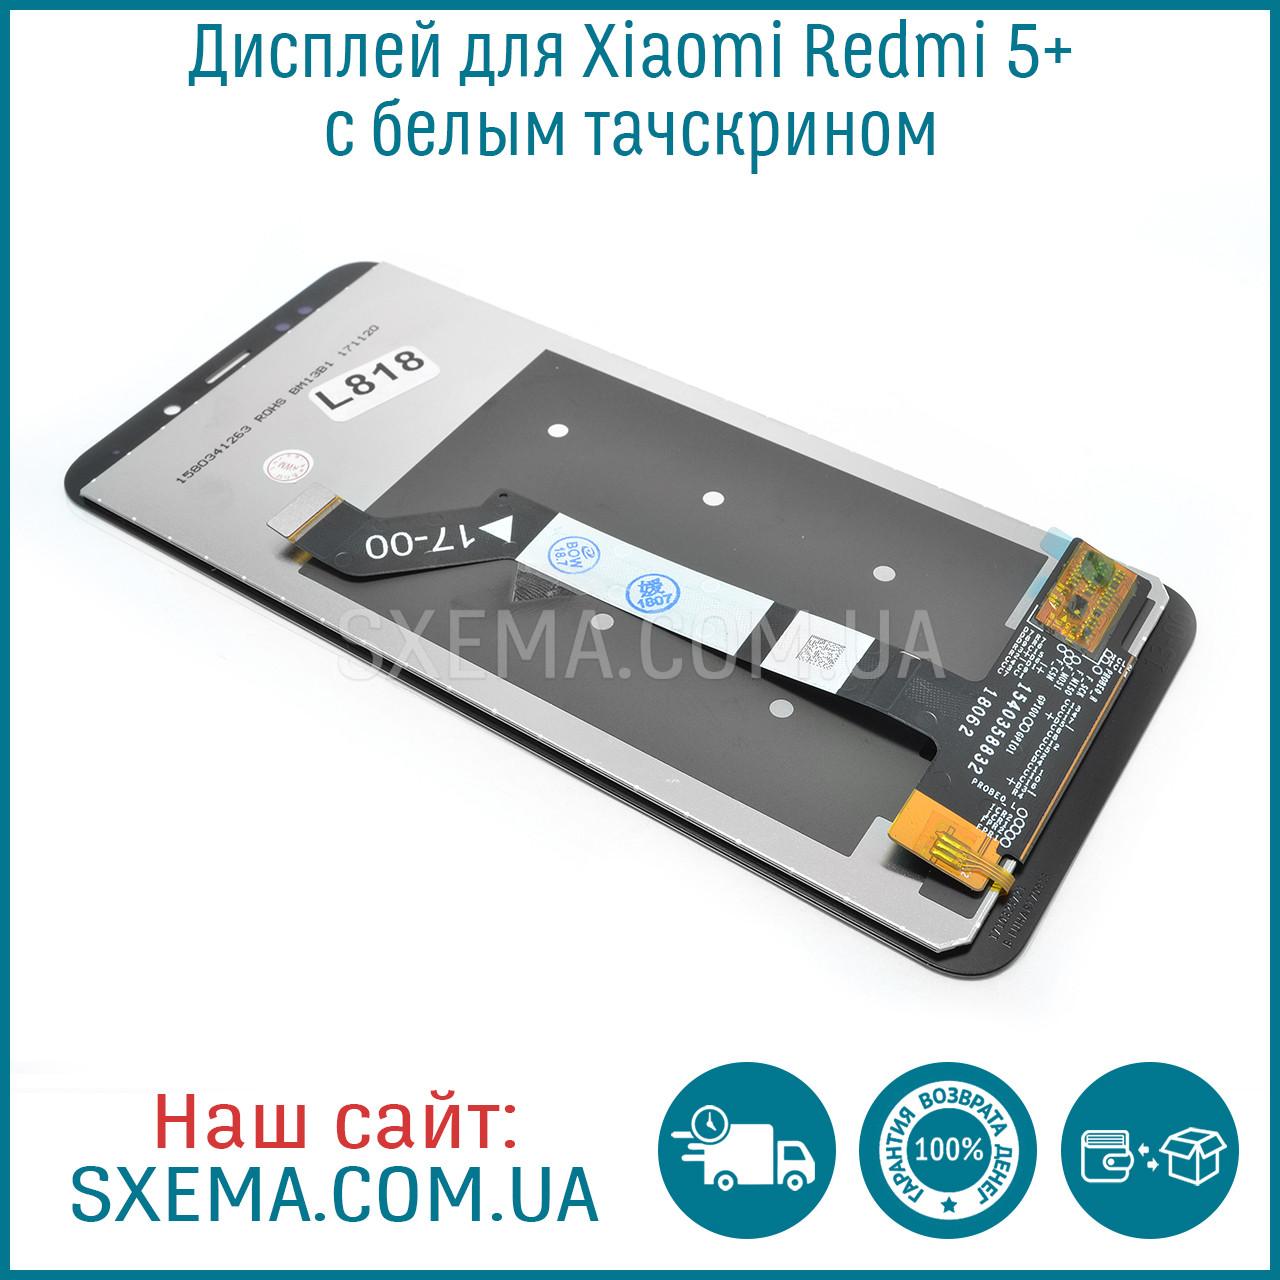 Дисплей для Xiaomi Redmi 5 plus оригинал с белым тачскрином, фото 1